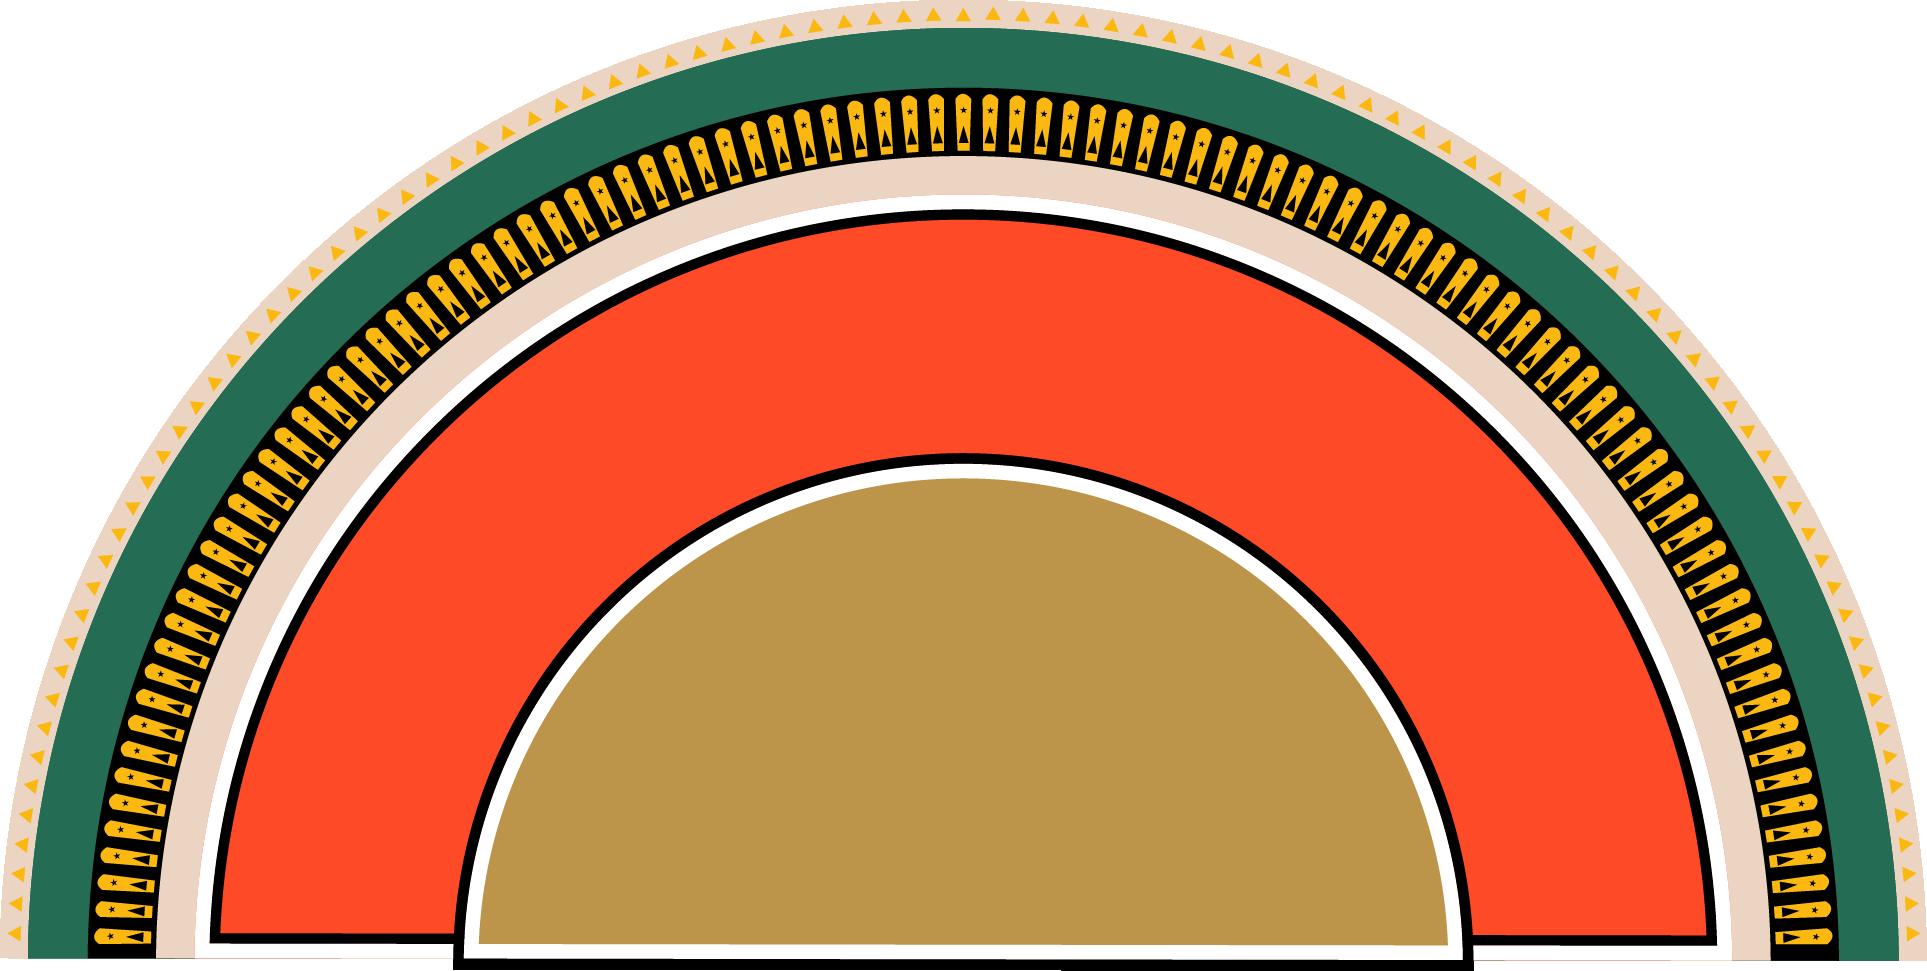 Adobe illustrator cut a. Clipart tv circle object